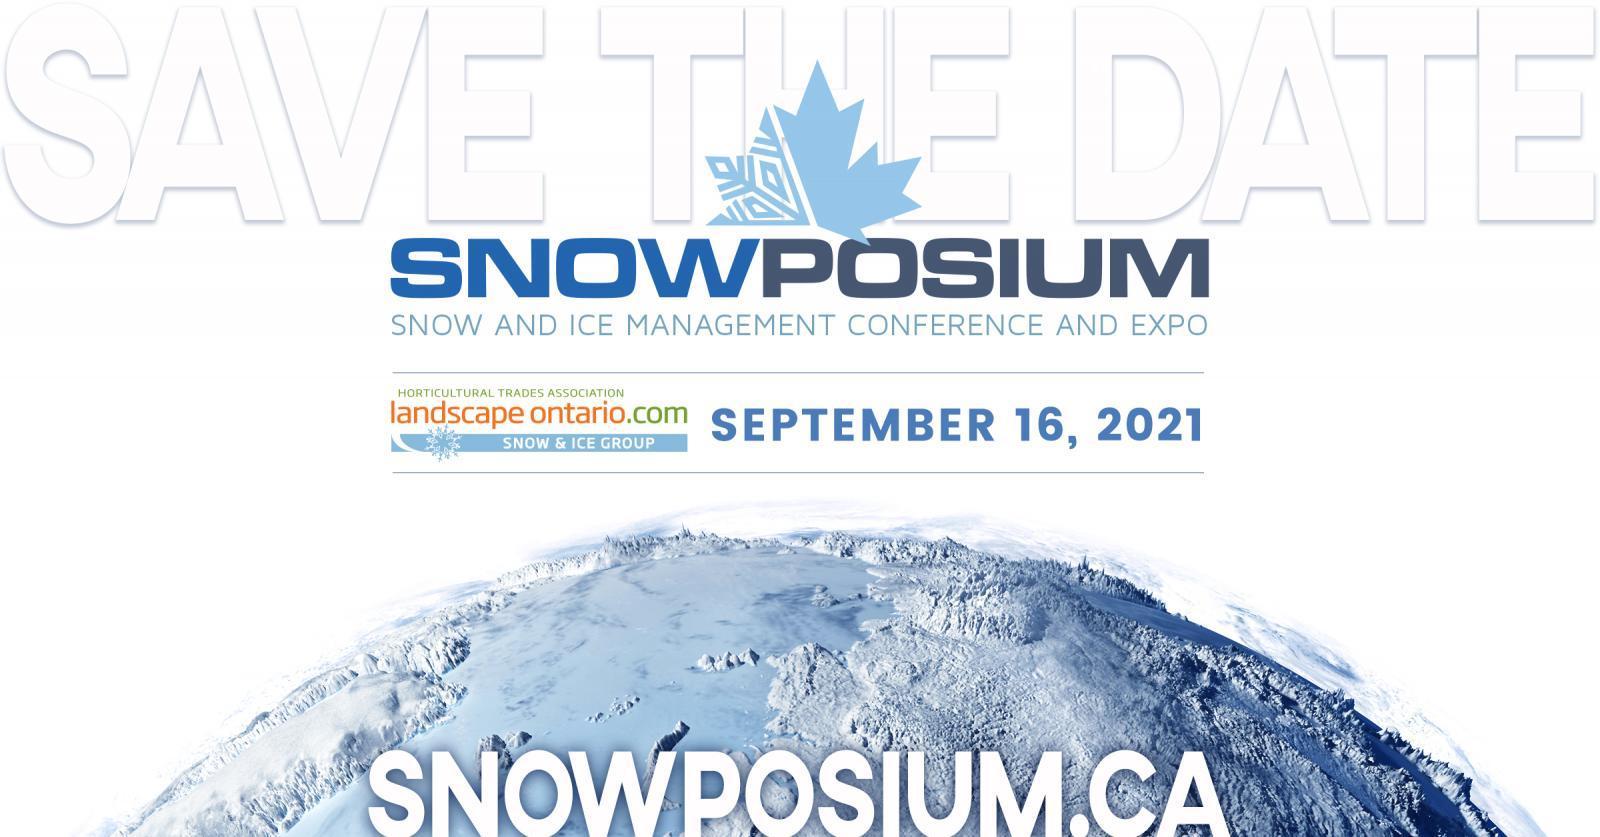 Snowposium goes virtual this September